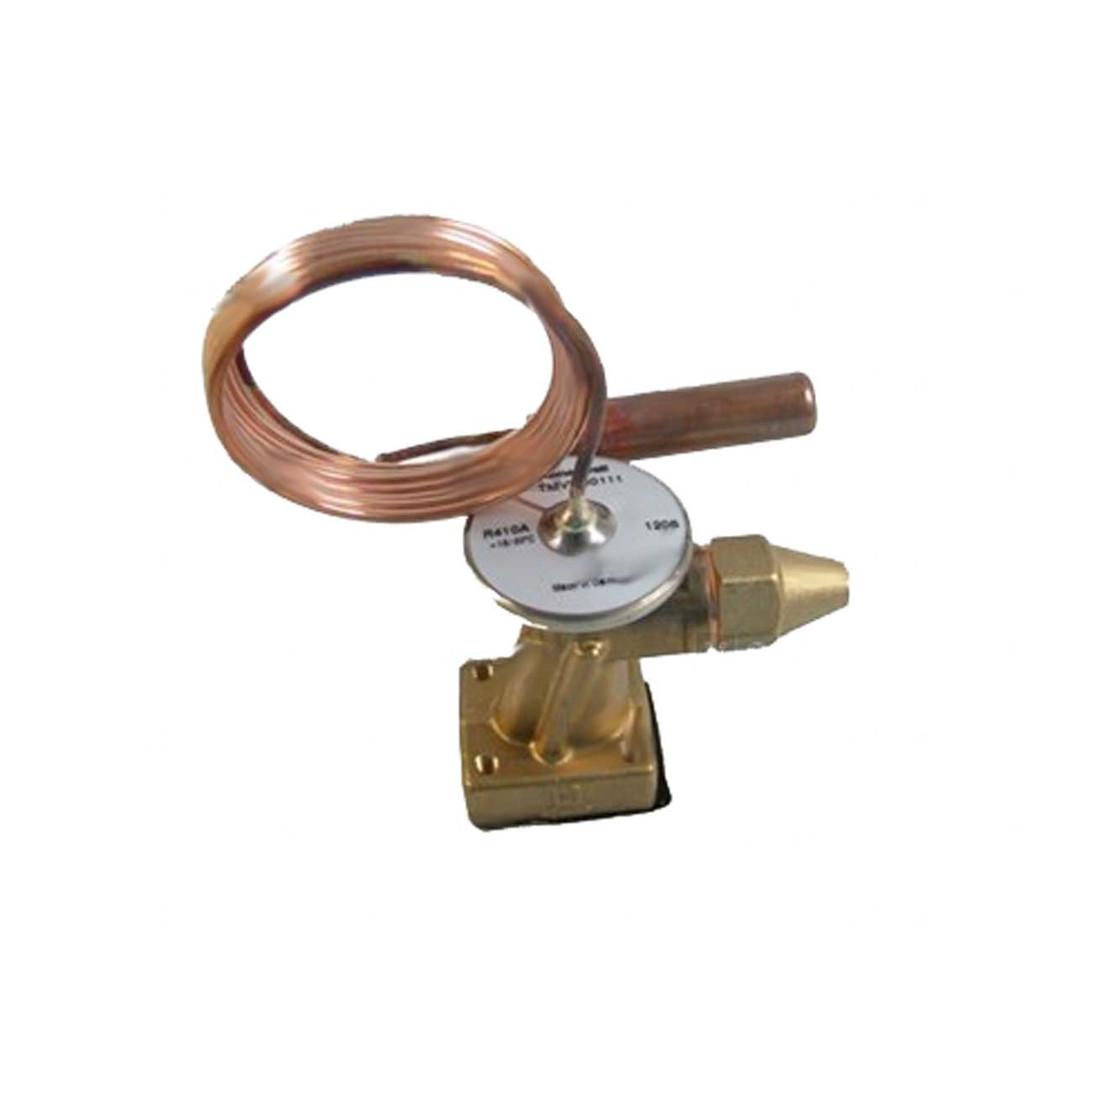 B310 Kity 1647 3 Stück Einweghobelmesser Wendemesser Ersatzmesser Hobelmesser